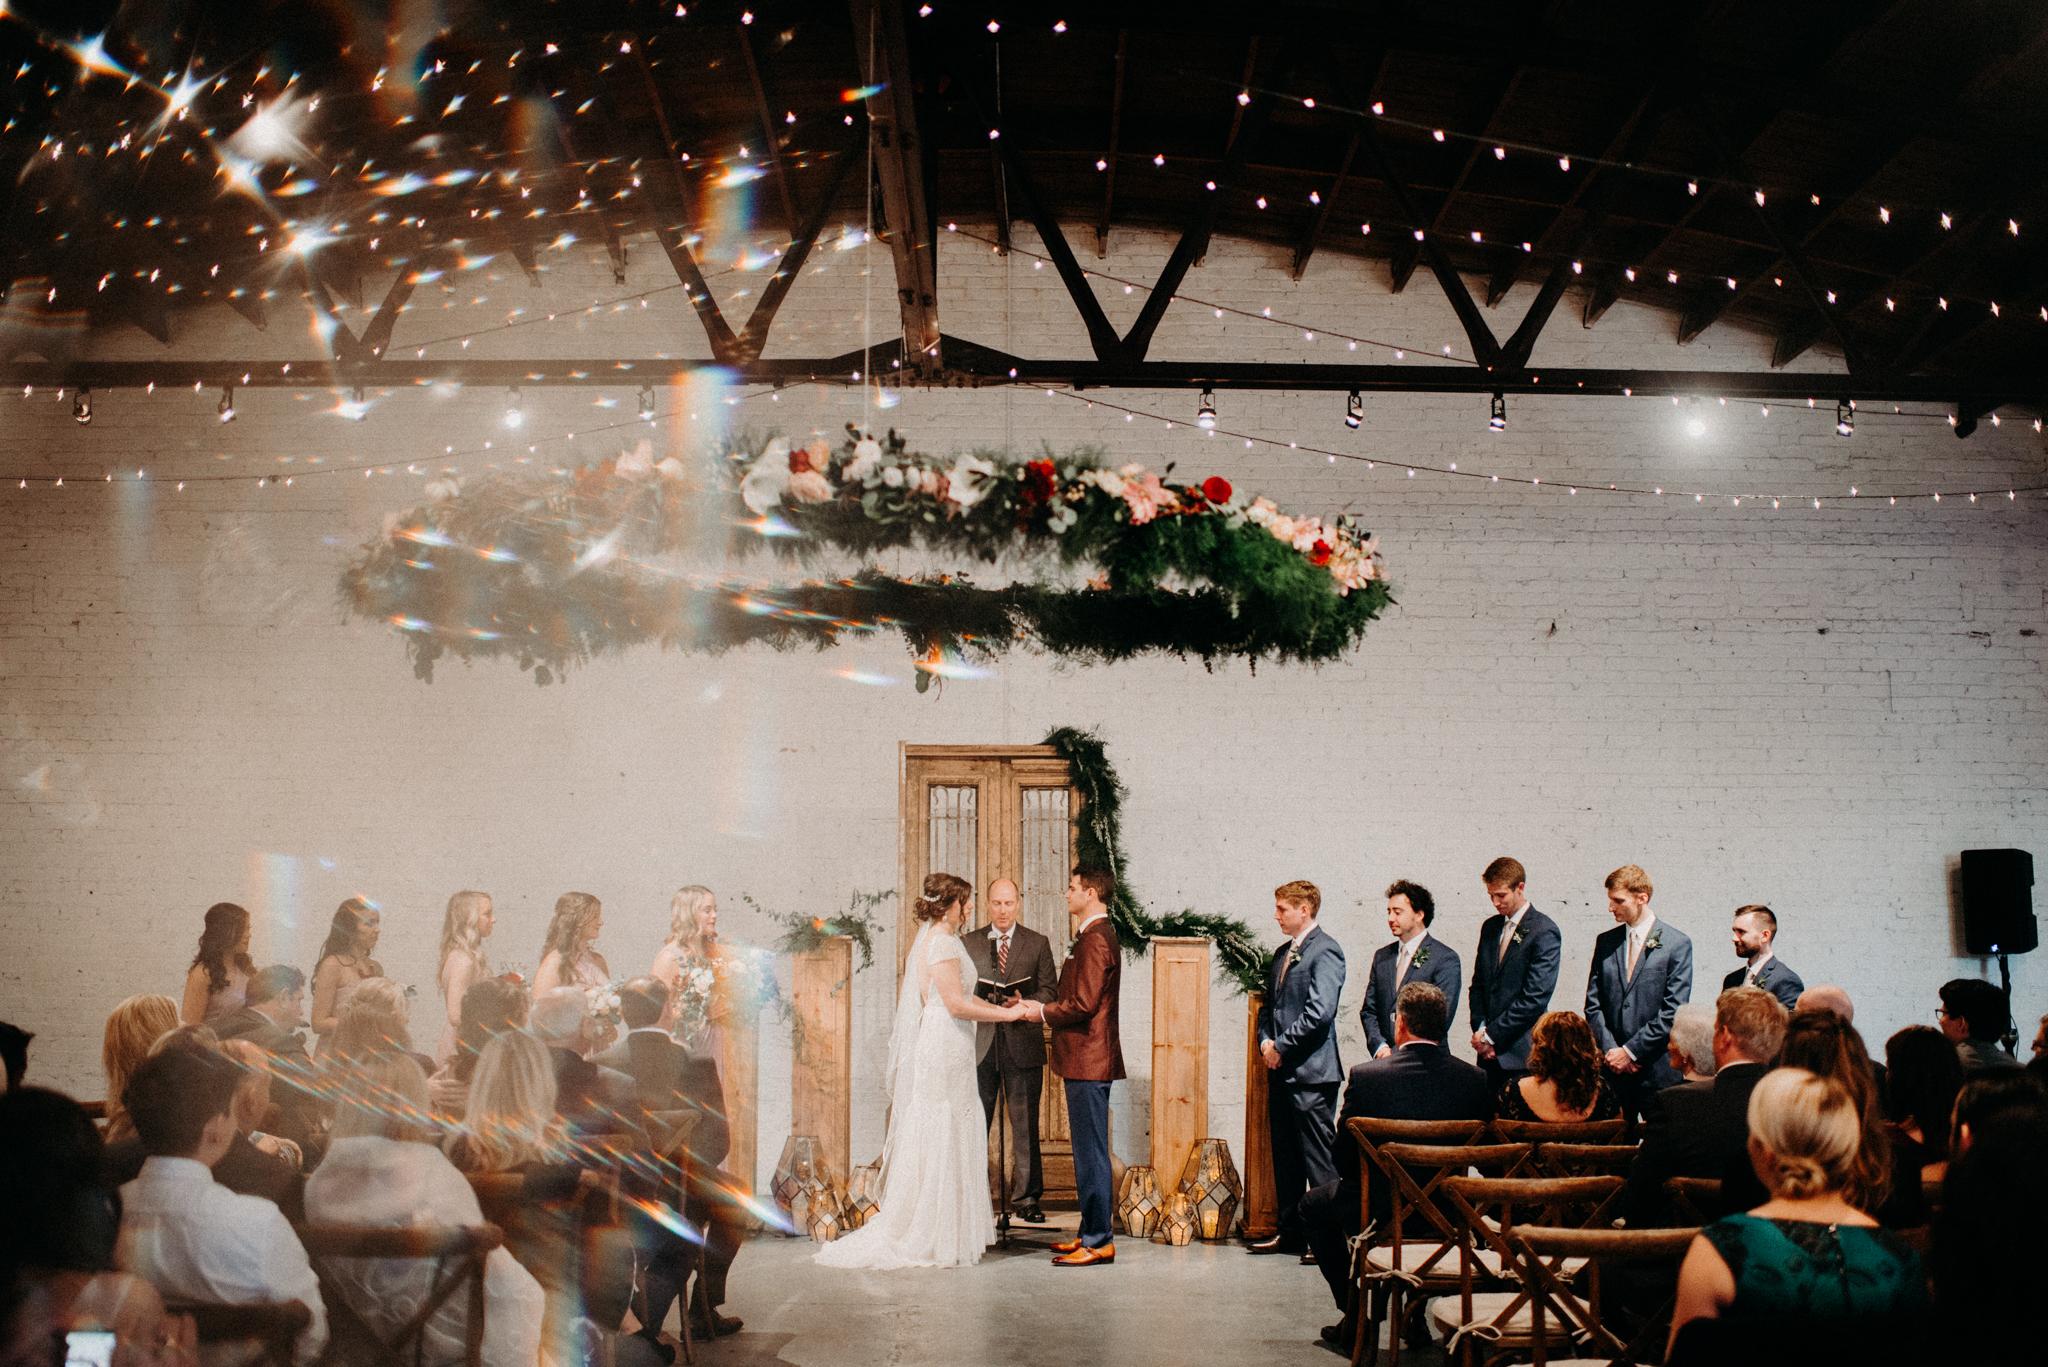 vintage-atlanta-wedding-brickyard-marietta-116-of-192.jpg